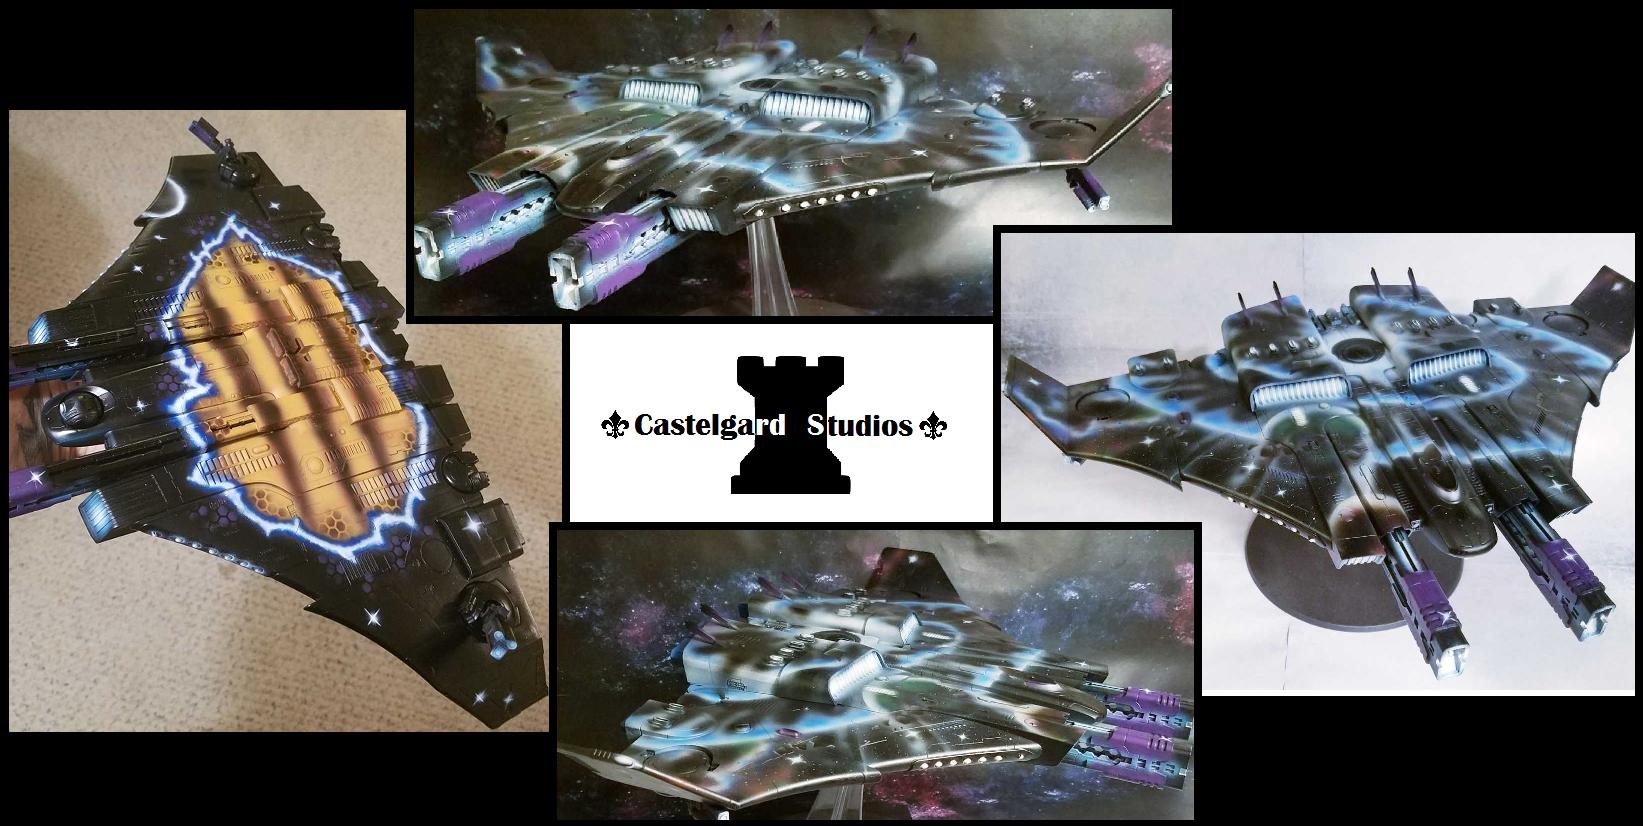 Airbrush, Castelgard Studios, Flyer, Lord Of War, Railcannon, Railgun, Space, Super-heavy, T'au, Tau, Tigershark, Warhammer 40,000